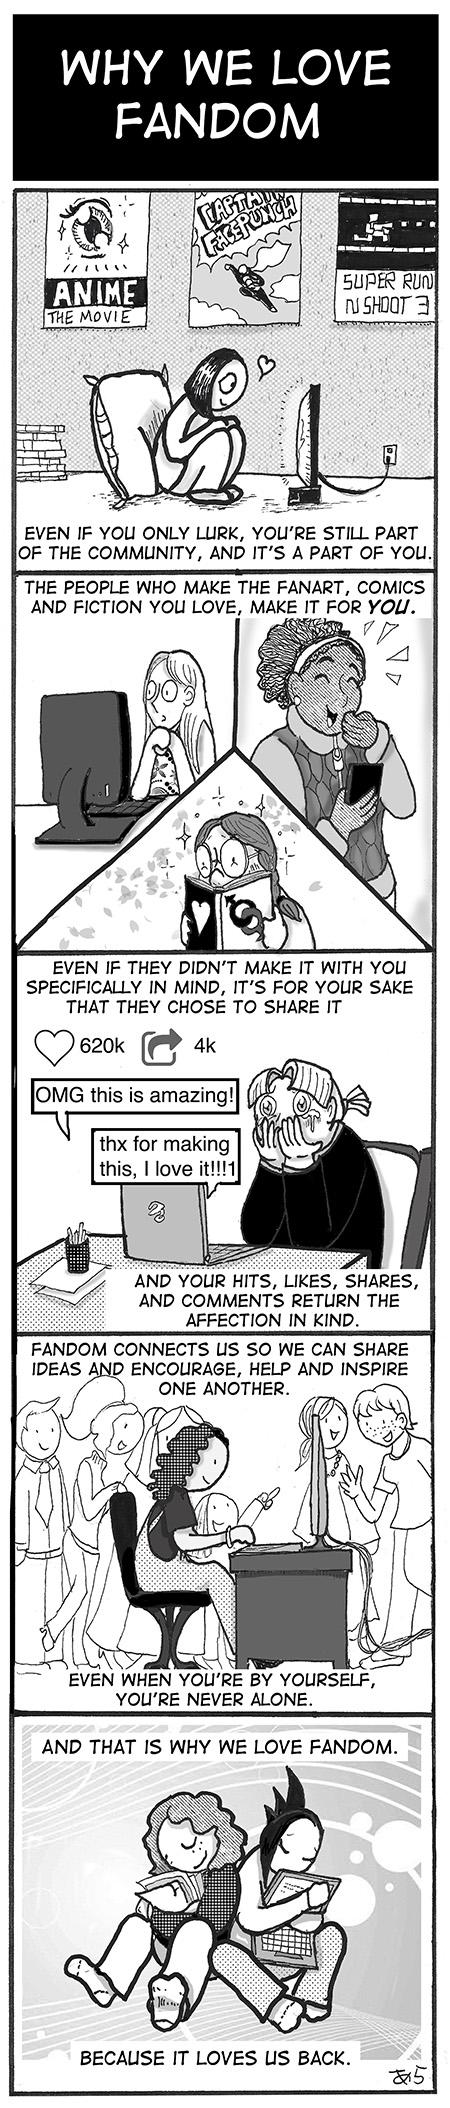 Why We Love Fandom